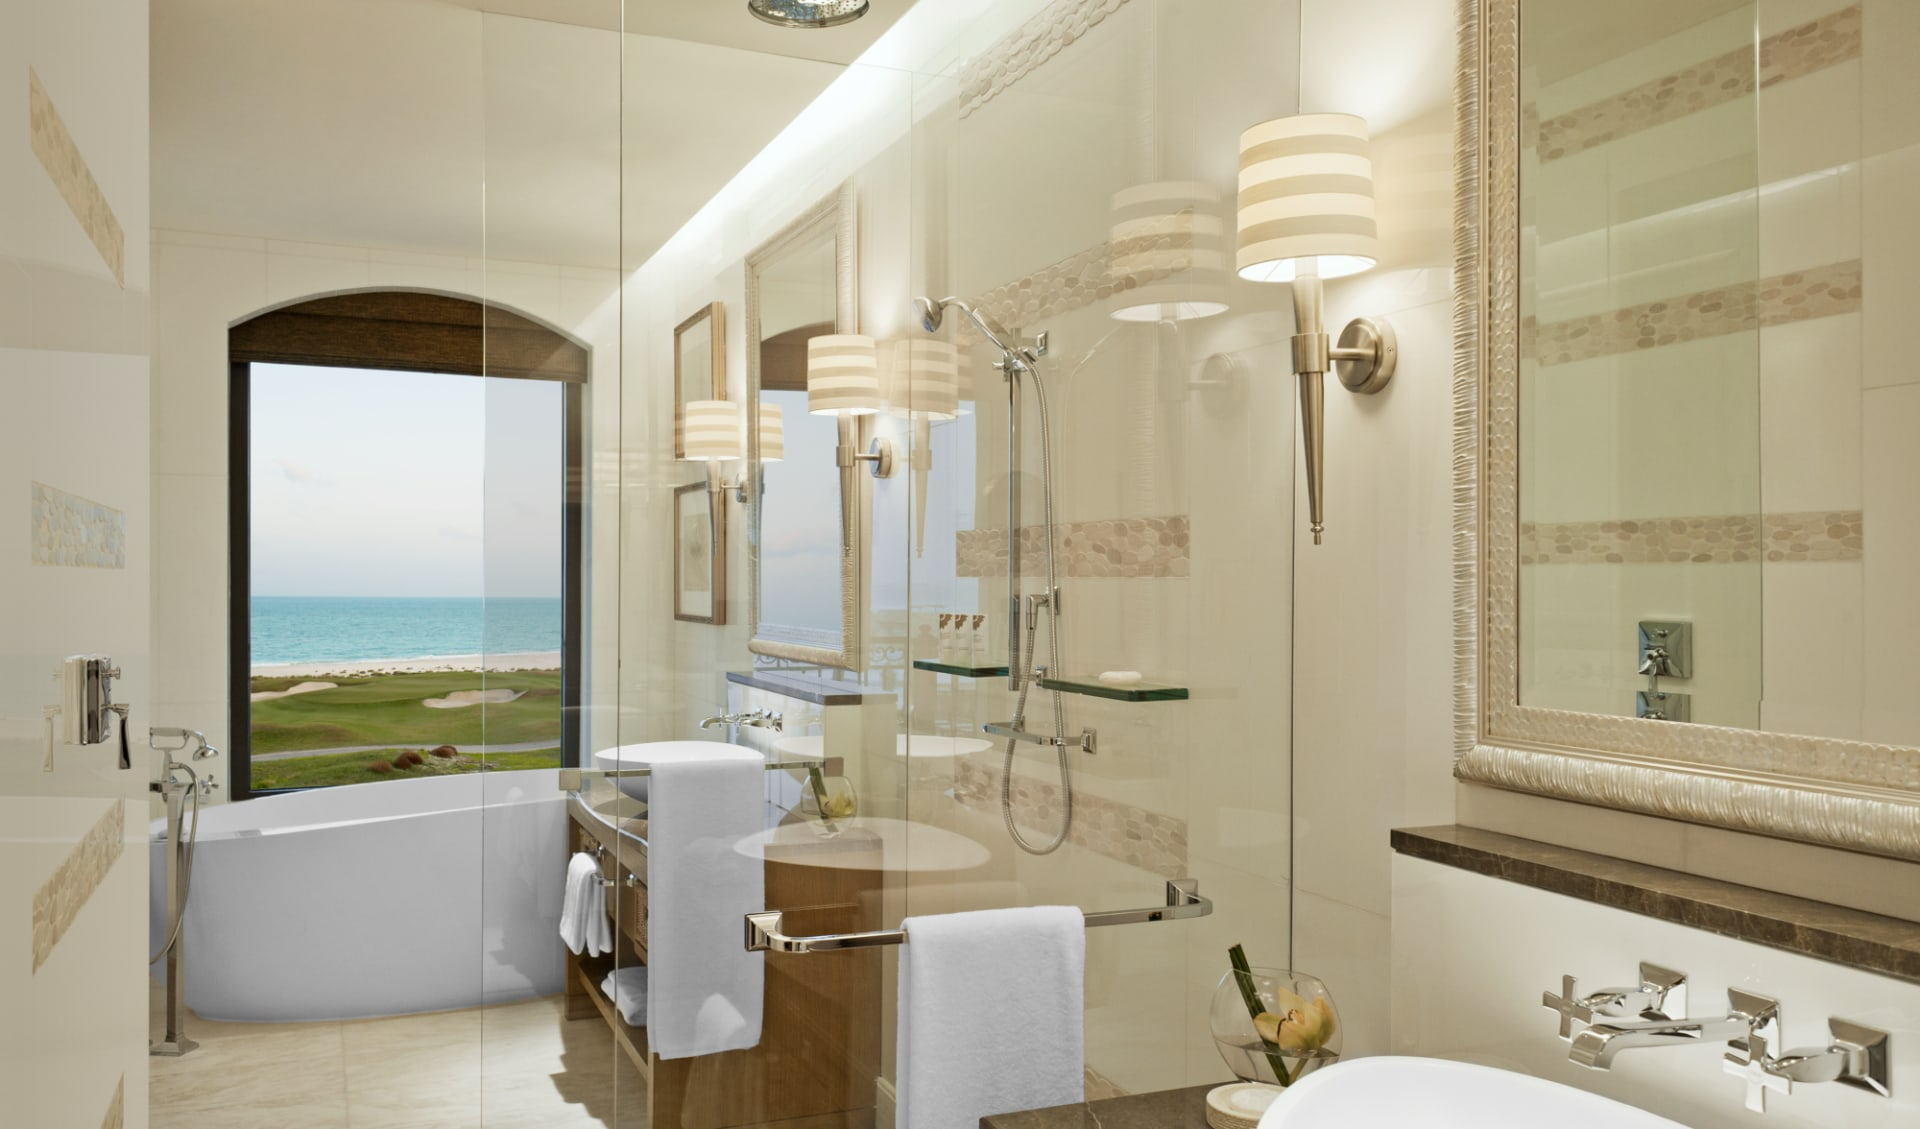 St. Regis Saadiyat Island Resort Abu Dhabi:  St. Regis Saadiyat Island Resort Abu Dhabi - Superior Sea View Badezimmer